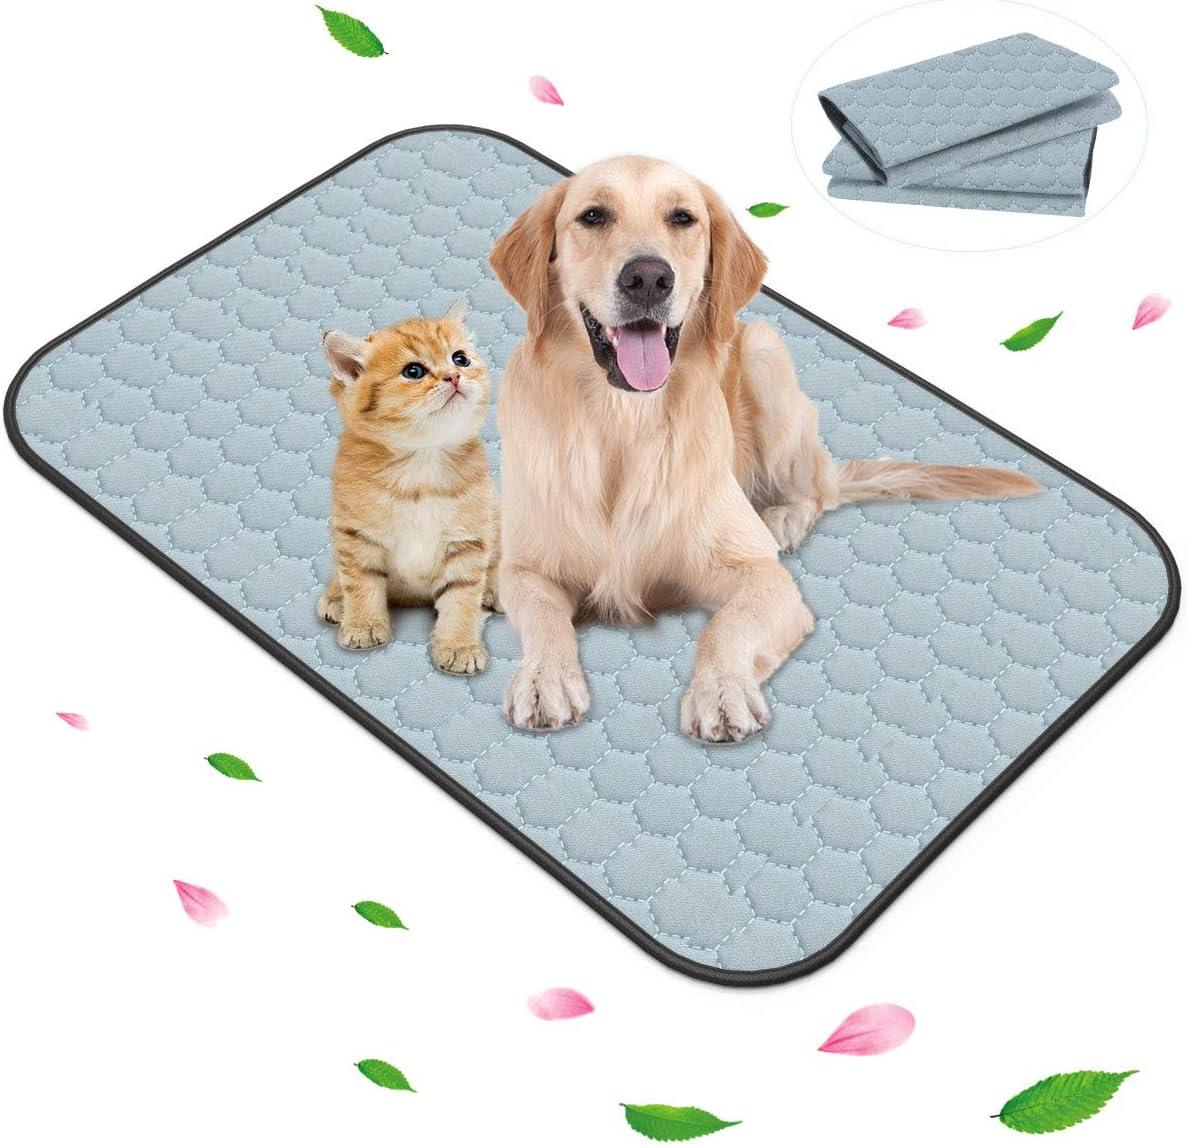 Pack of 30 Ultra Absorbent Pet Pee Training Pads//Leak-proof Anti Slip Mats//Multi Pack Offers- Keraiz 60x60 cm Puppy Pads//Thick